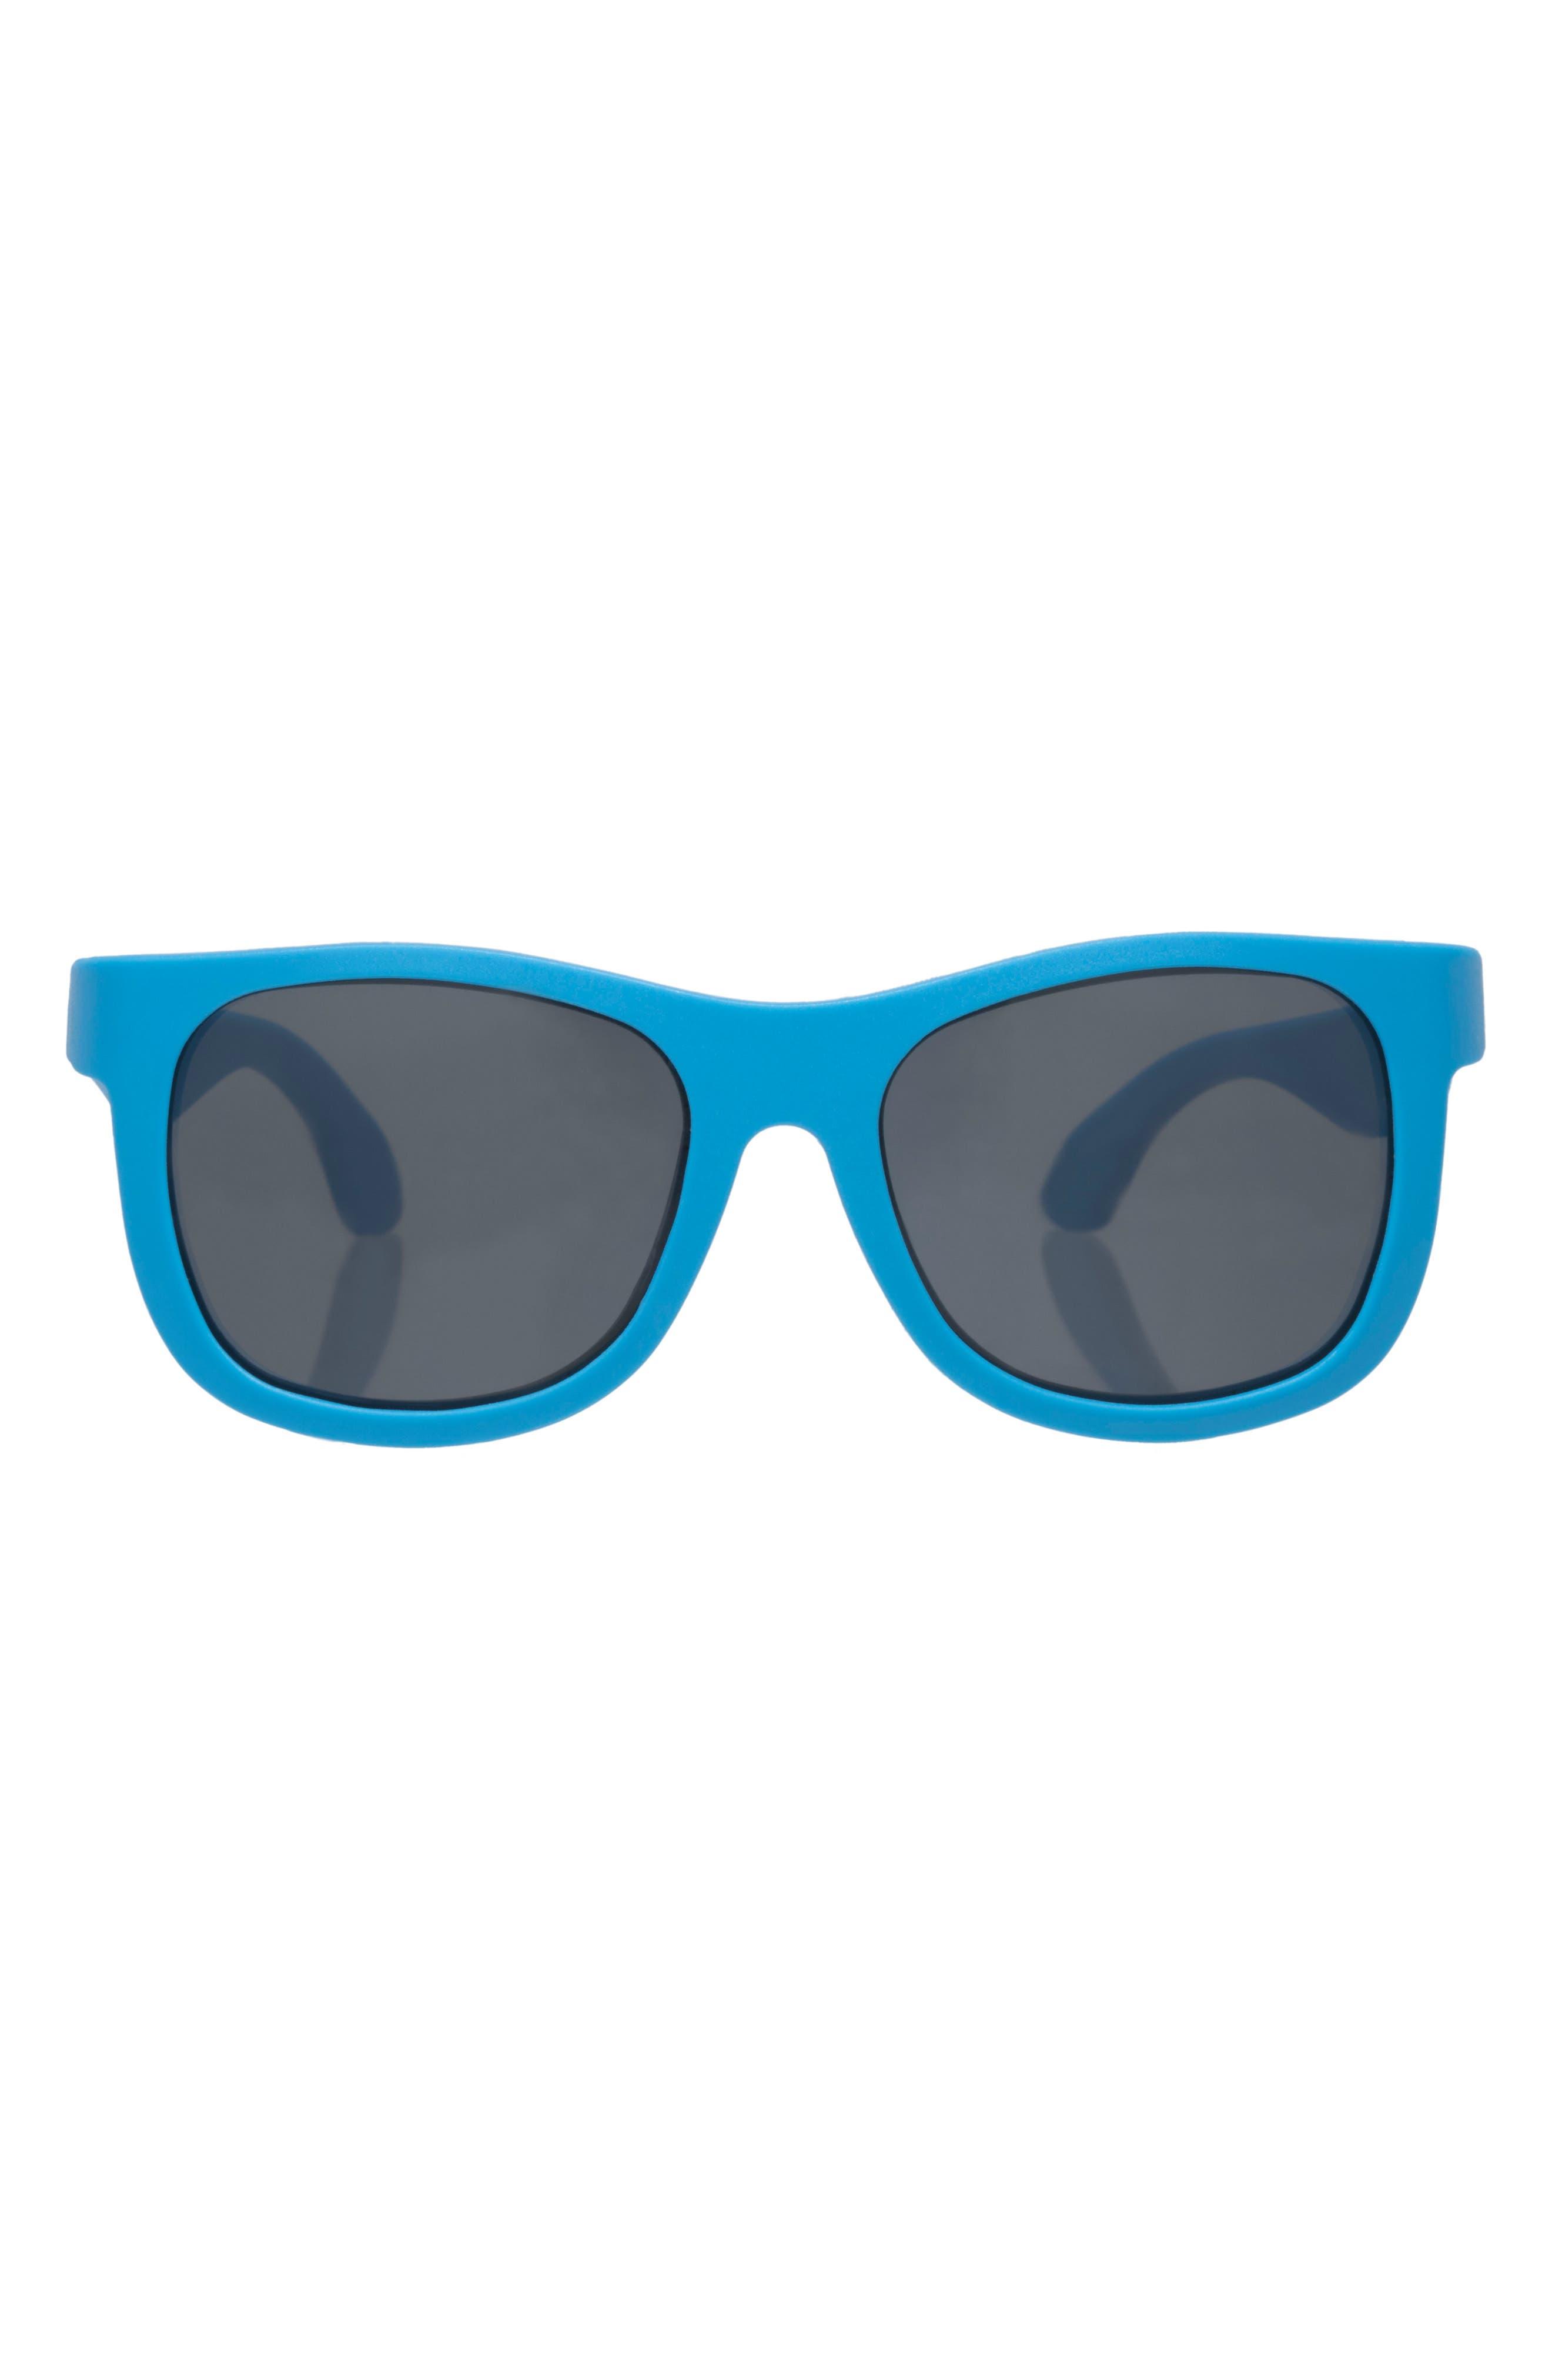 BABIATORS Original Navigators Sunglasses, Main, color, BLUE CRUSH